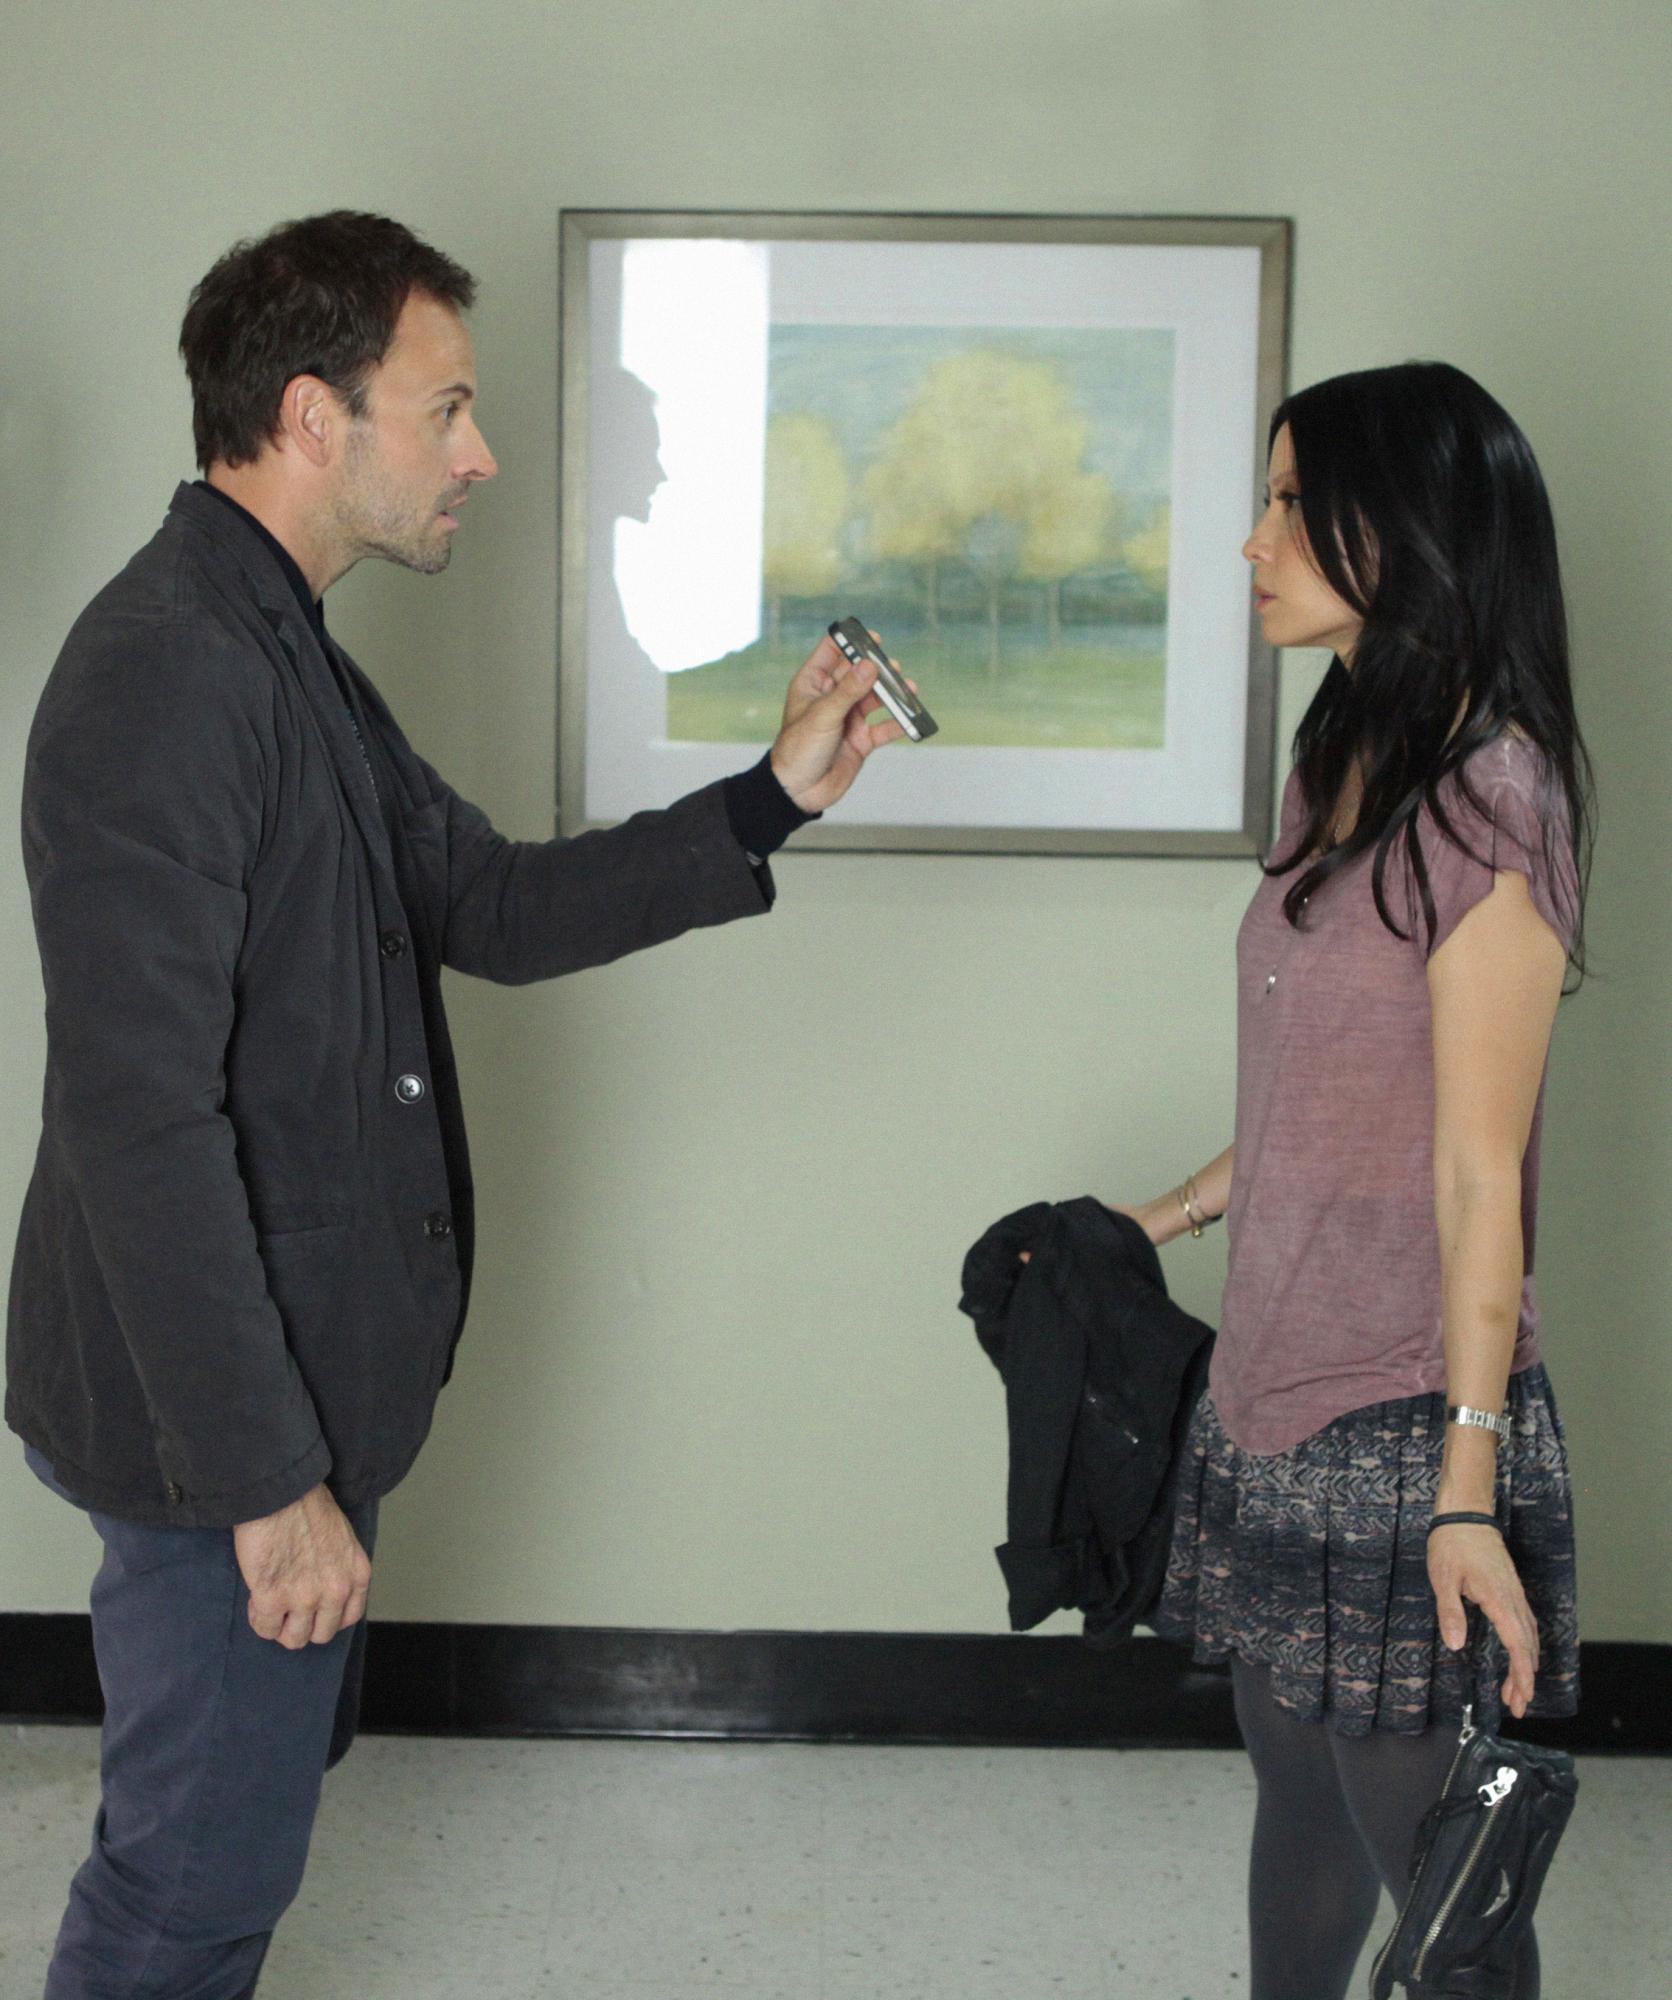 Sherlock and Joan Investigate